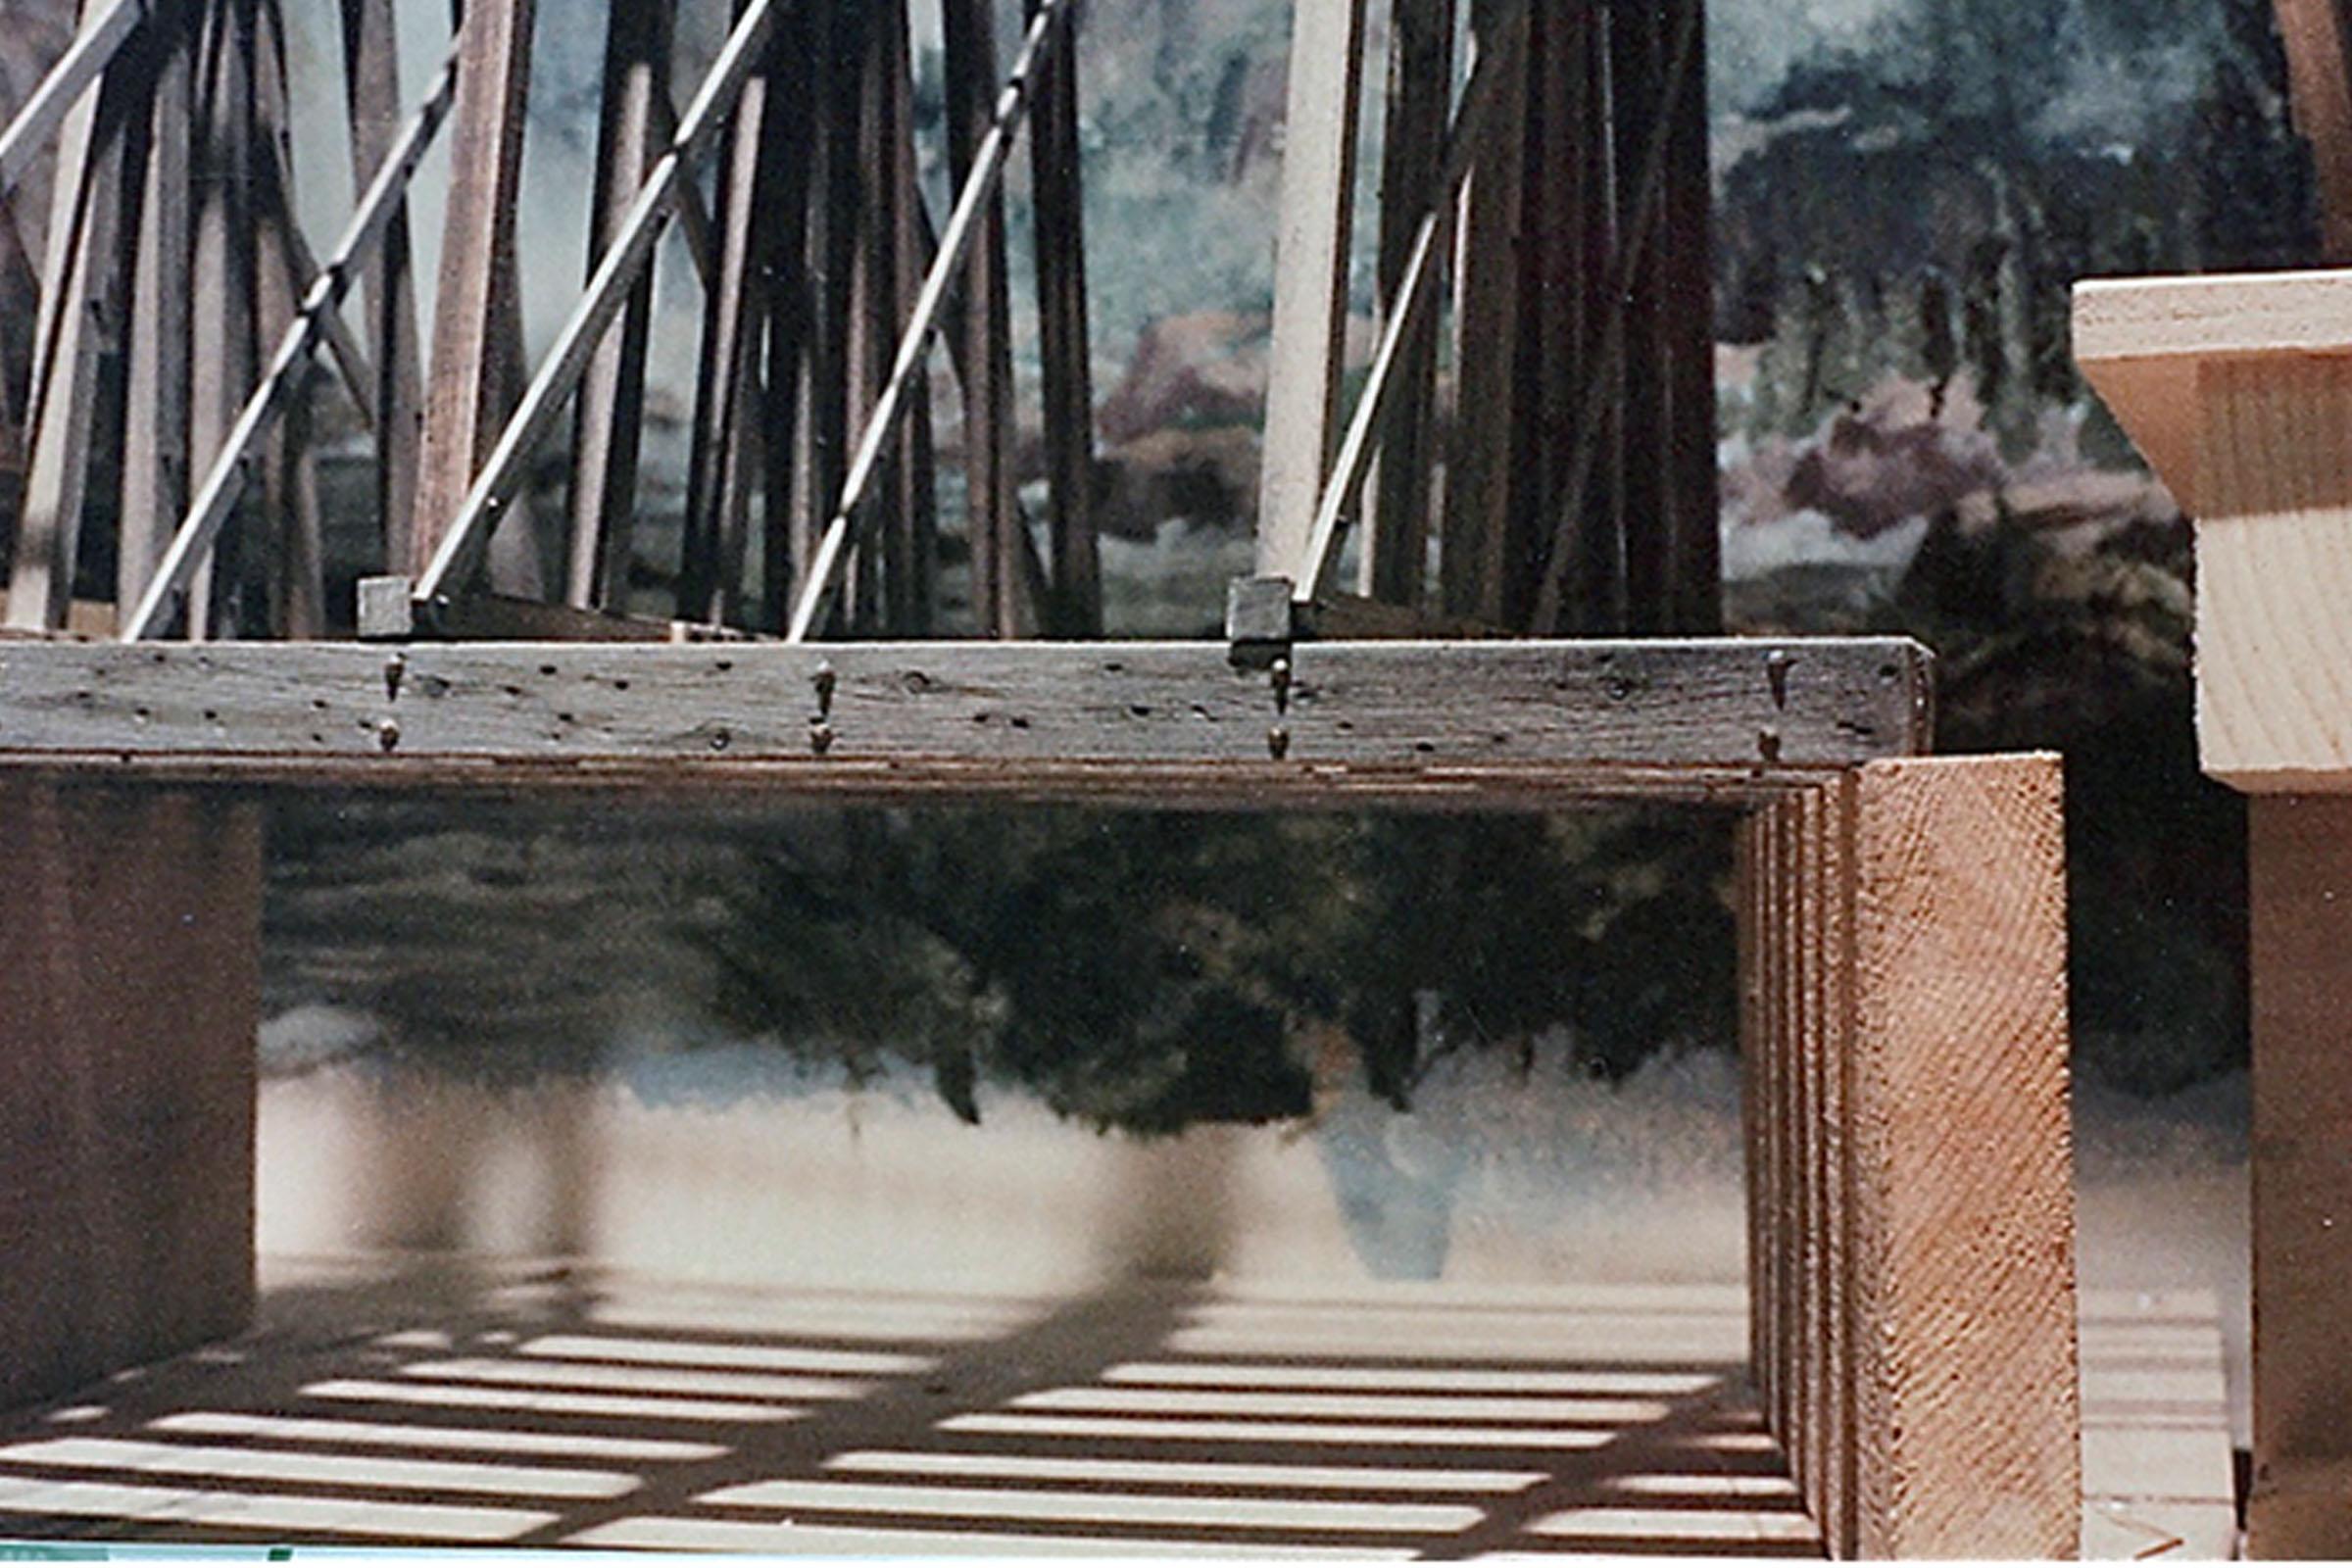 lex-trestle-3.jpg